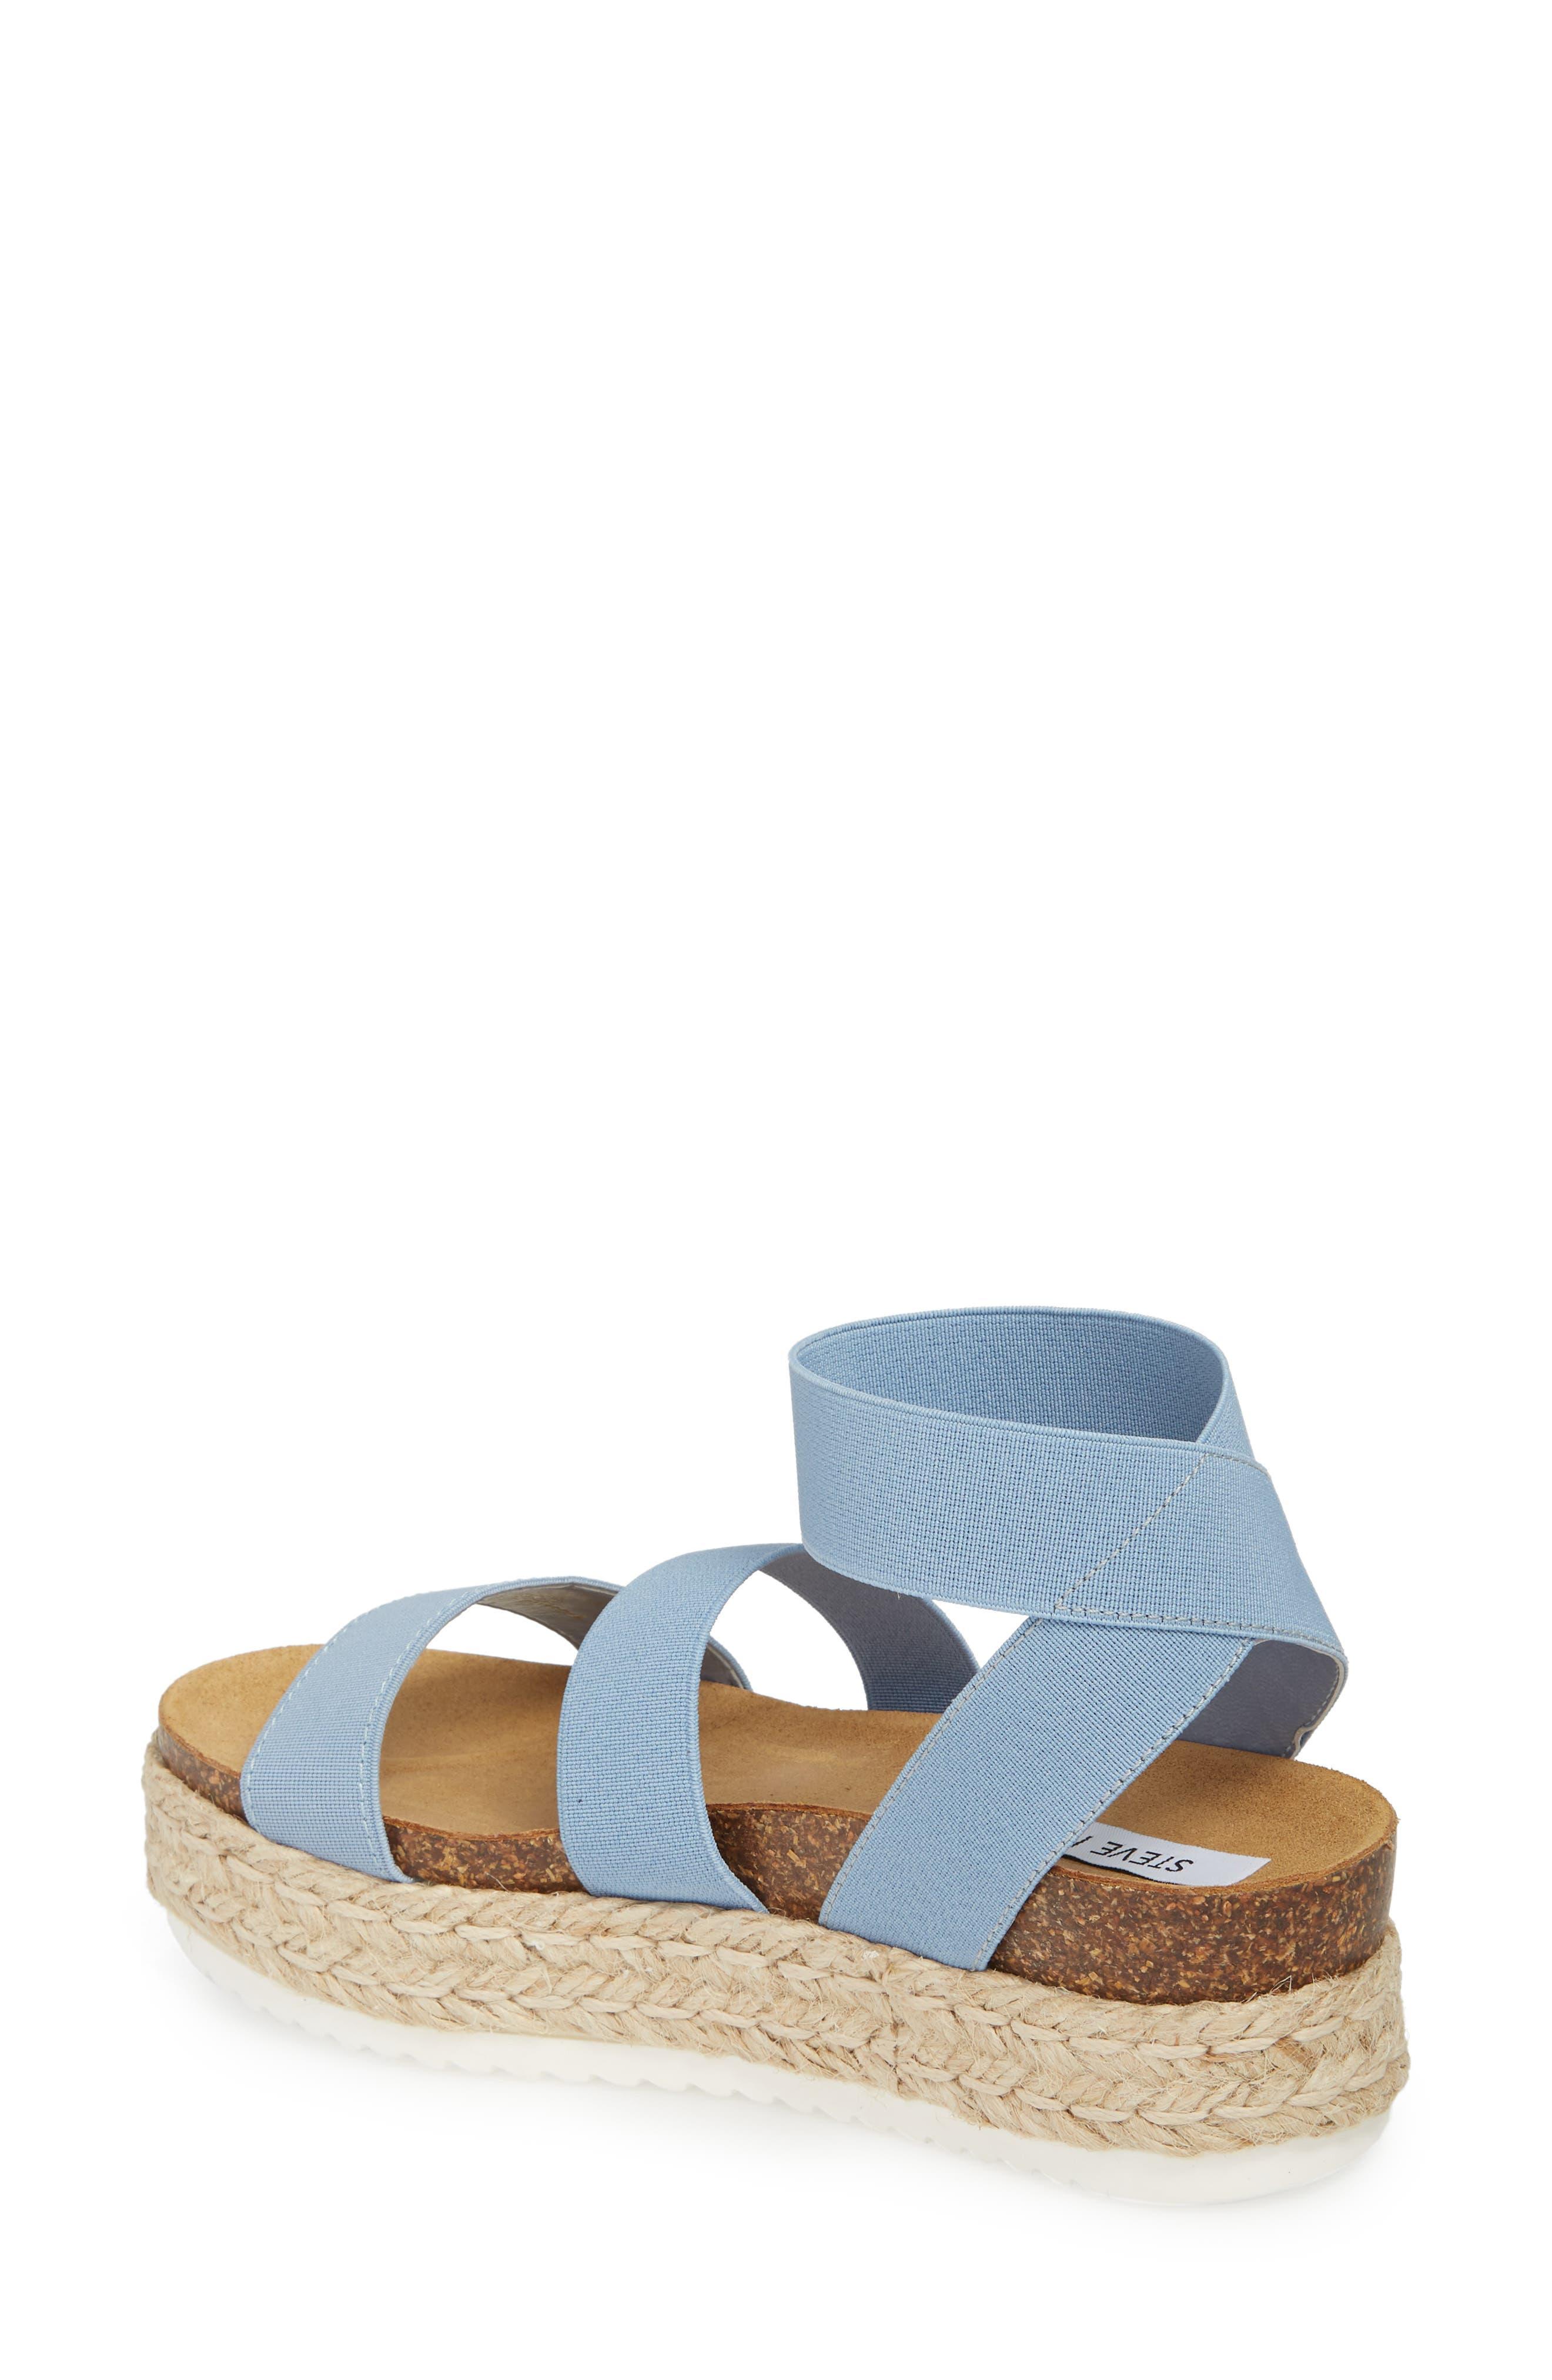 Kimmie Flatform Sandal,                             Alternate thumbnail 2, color,                             Blue